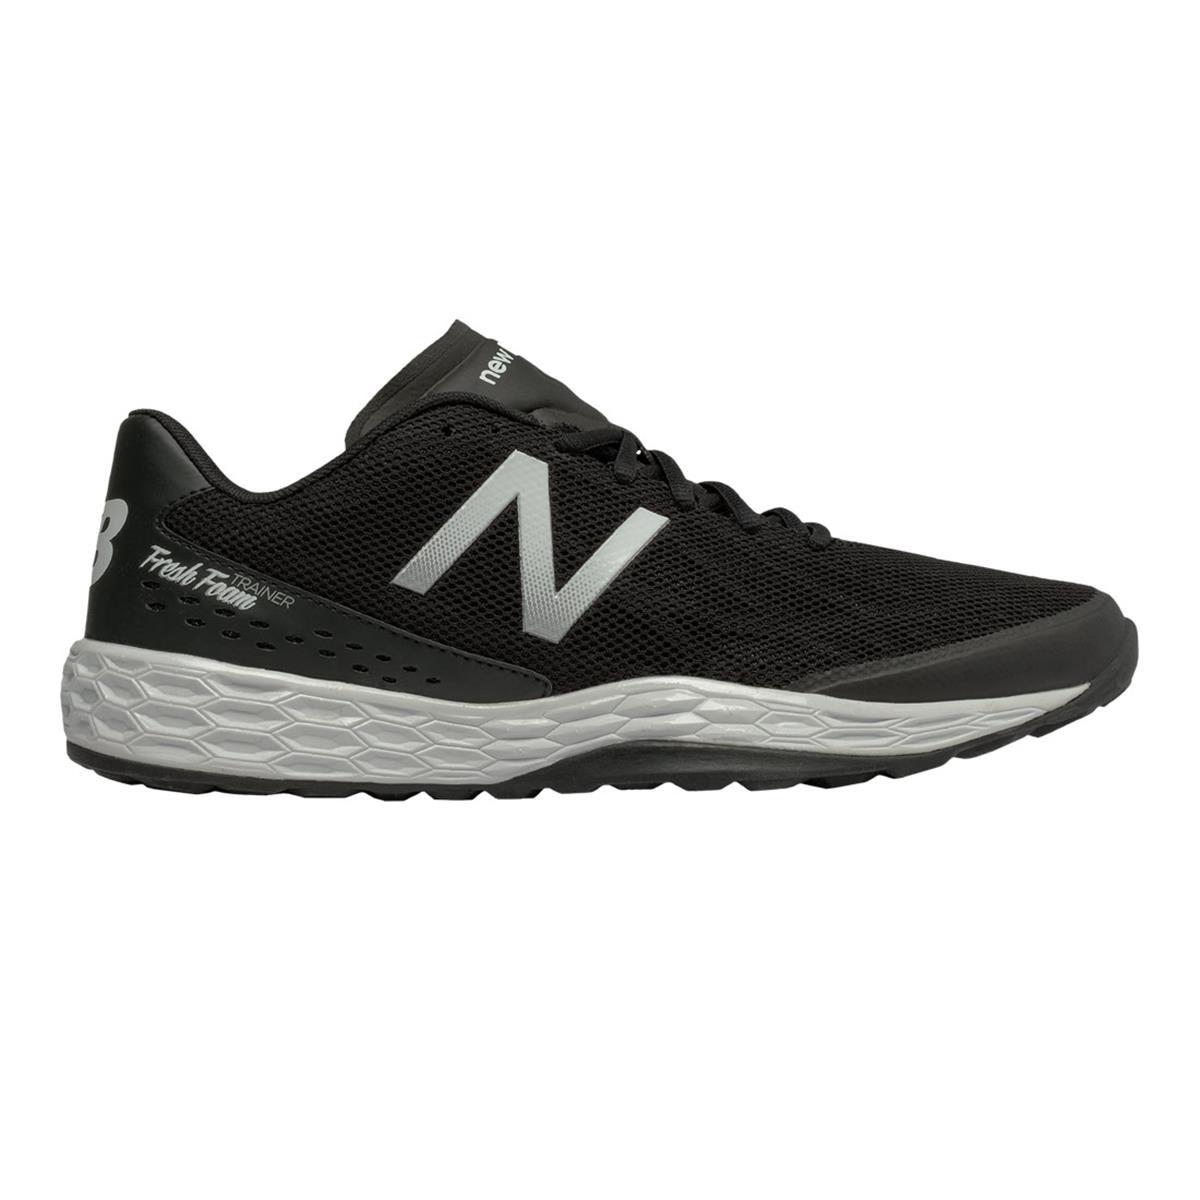 New Balance MX80 v3 Mens Training Shoes